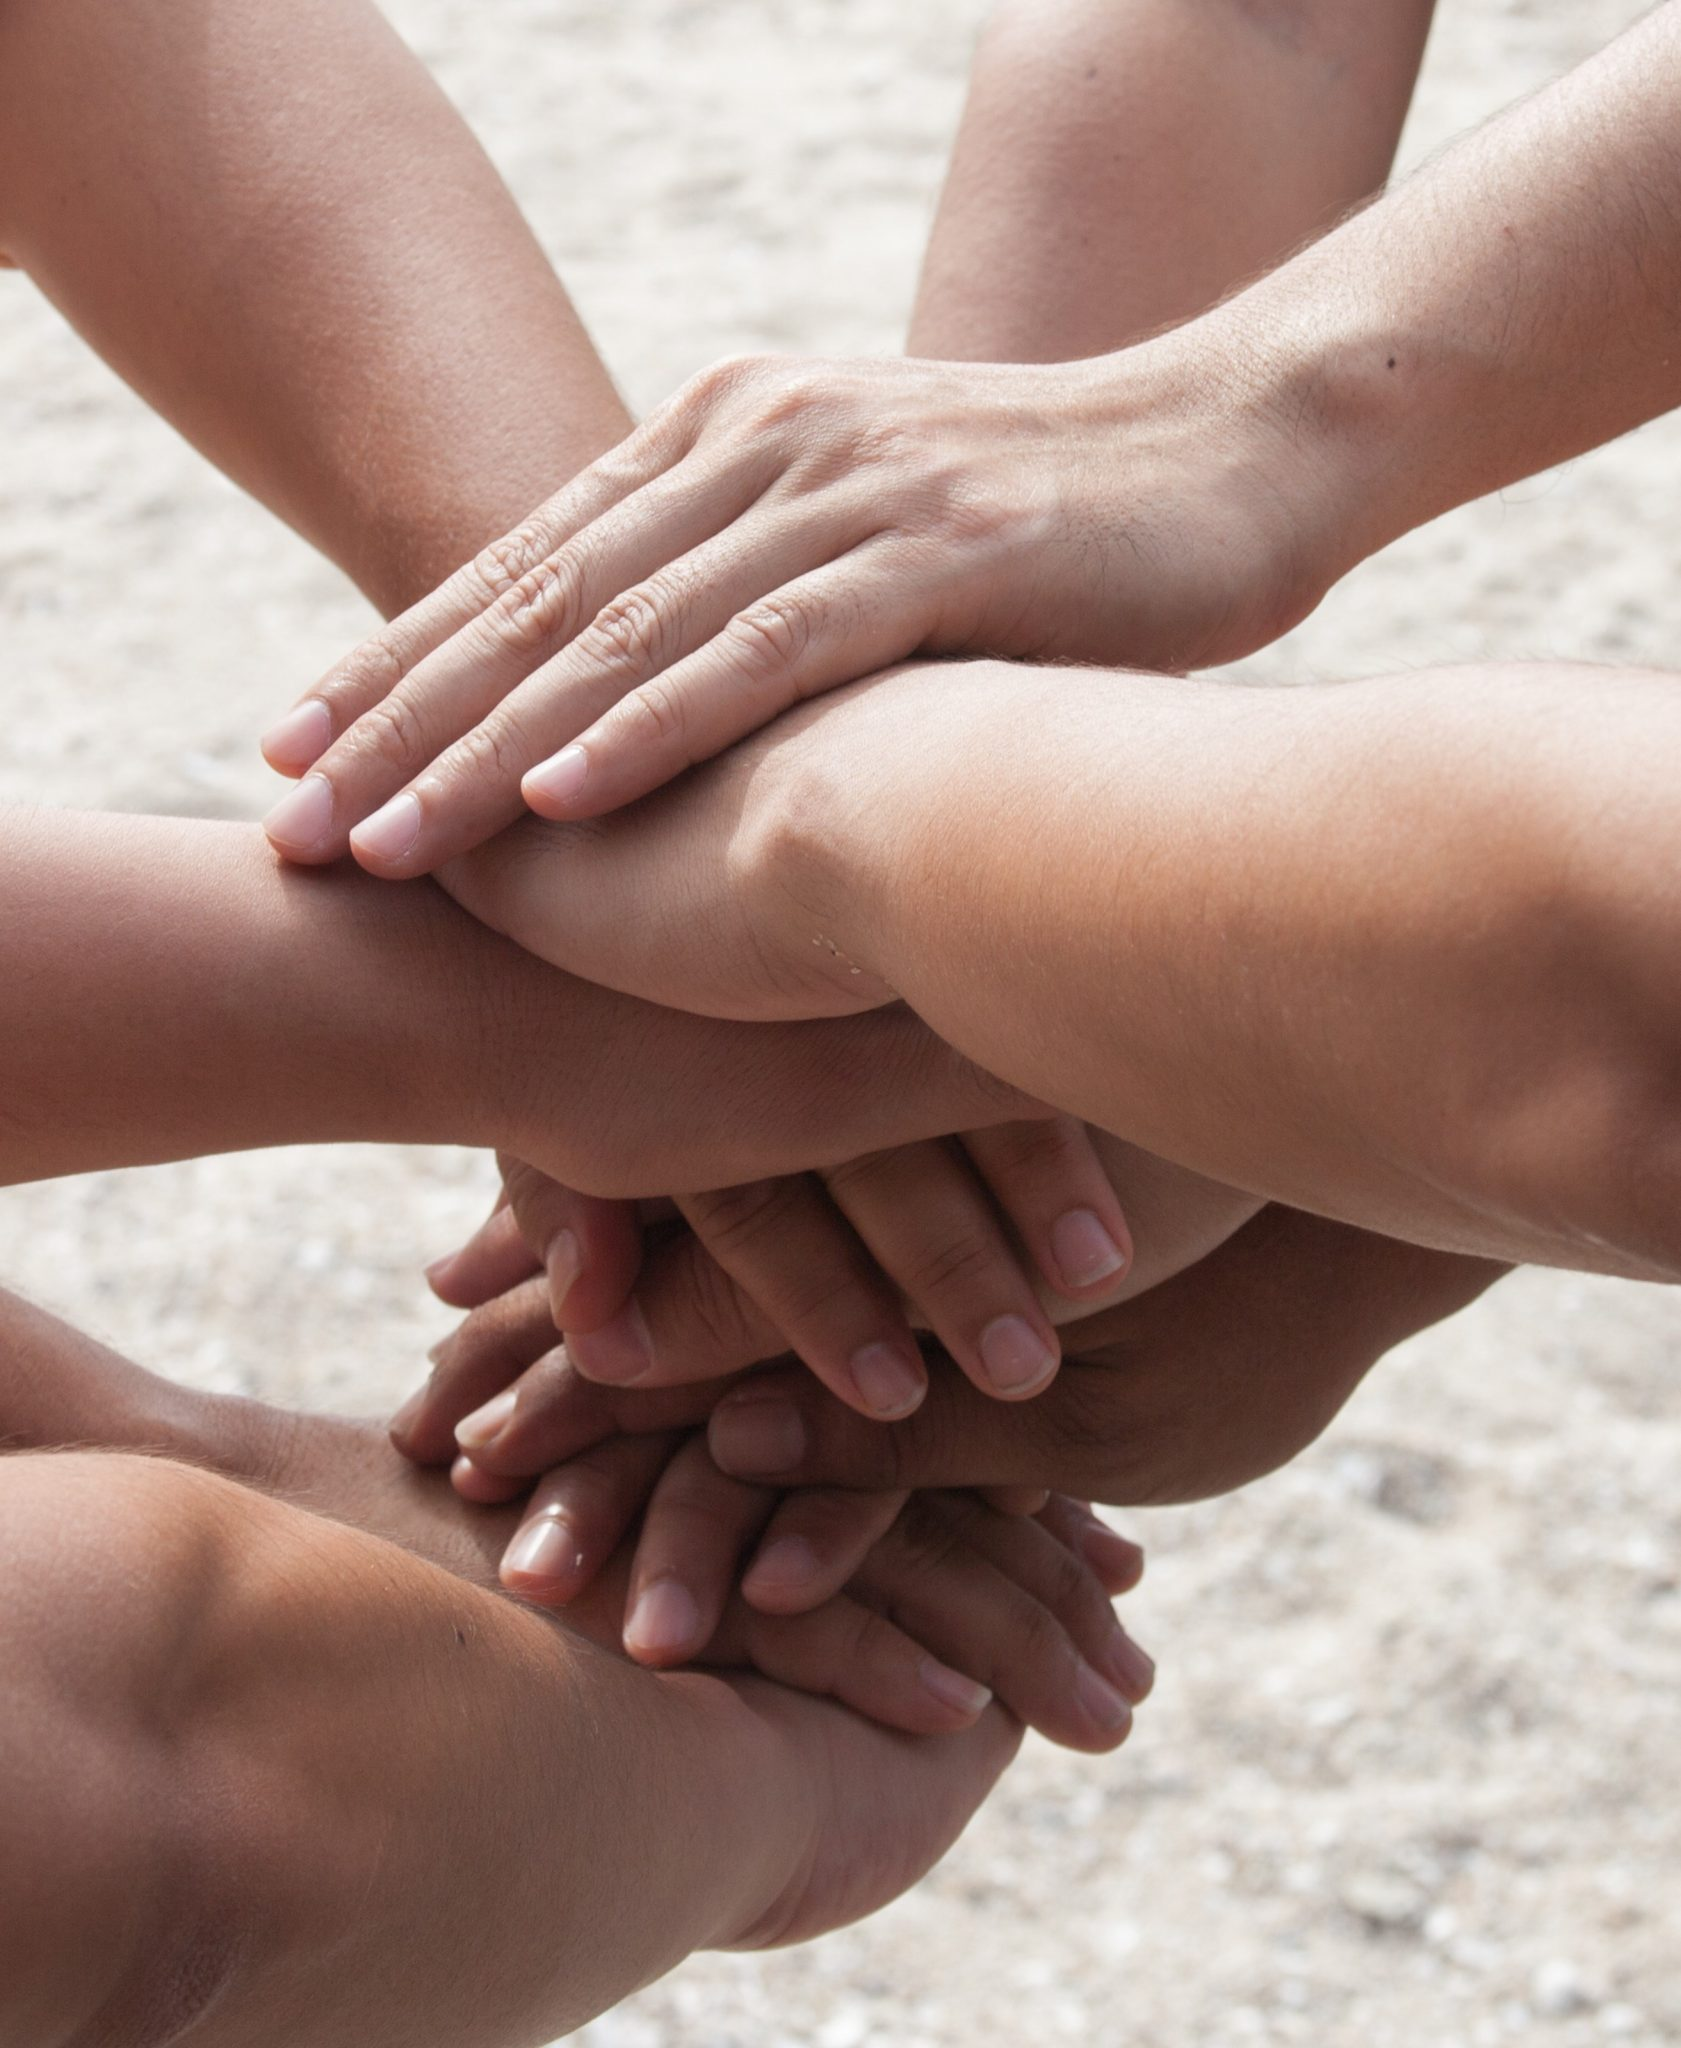 cheer, group work, teamwork